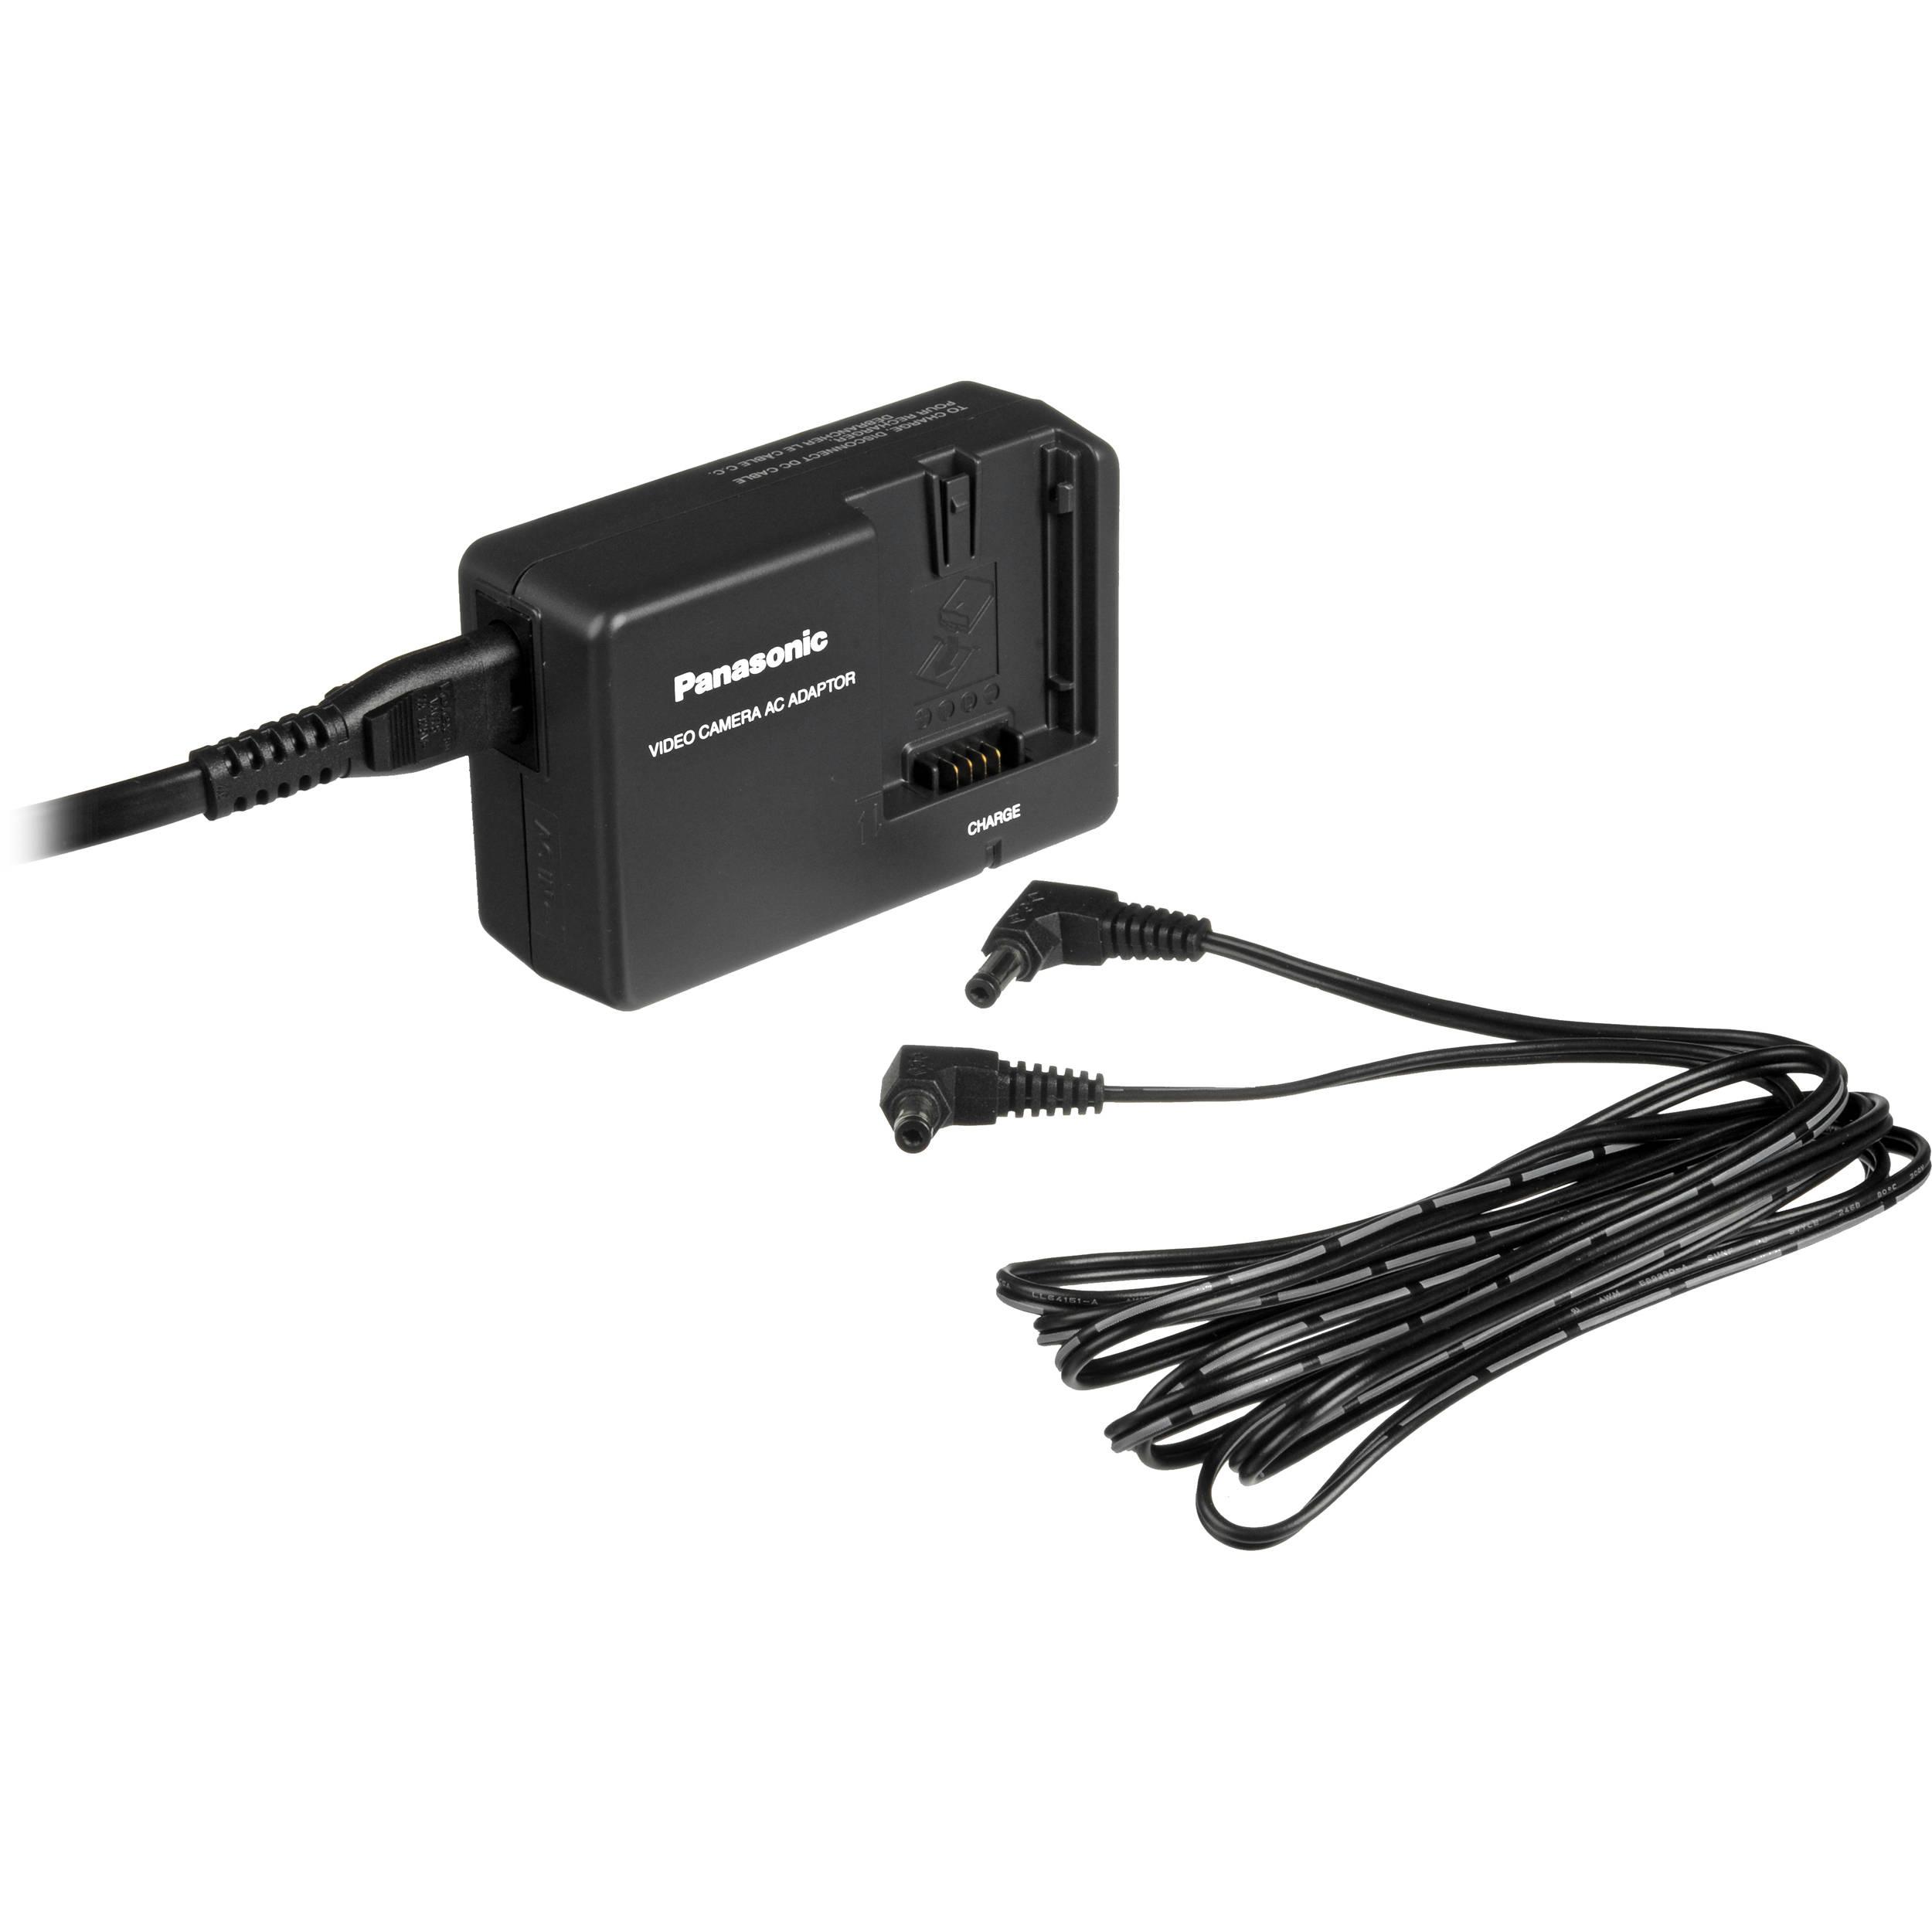 panasonic pv dac14kit ac adapter kit pv dac14kit b h photo video rh bhphotovideo com  panasonic pv gs65 manual